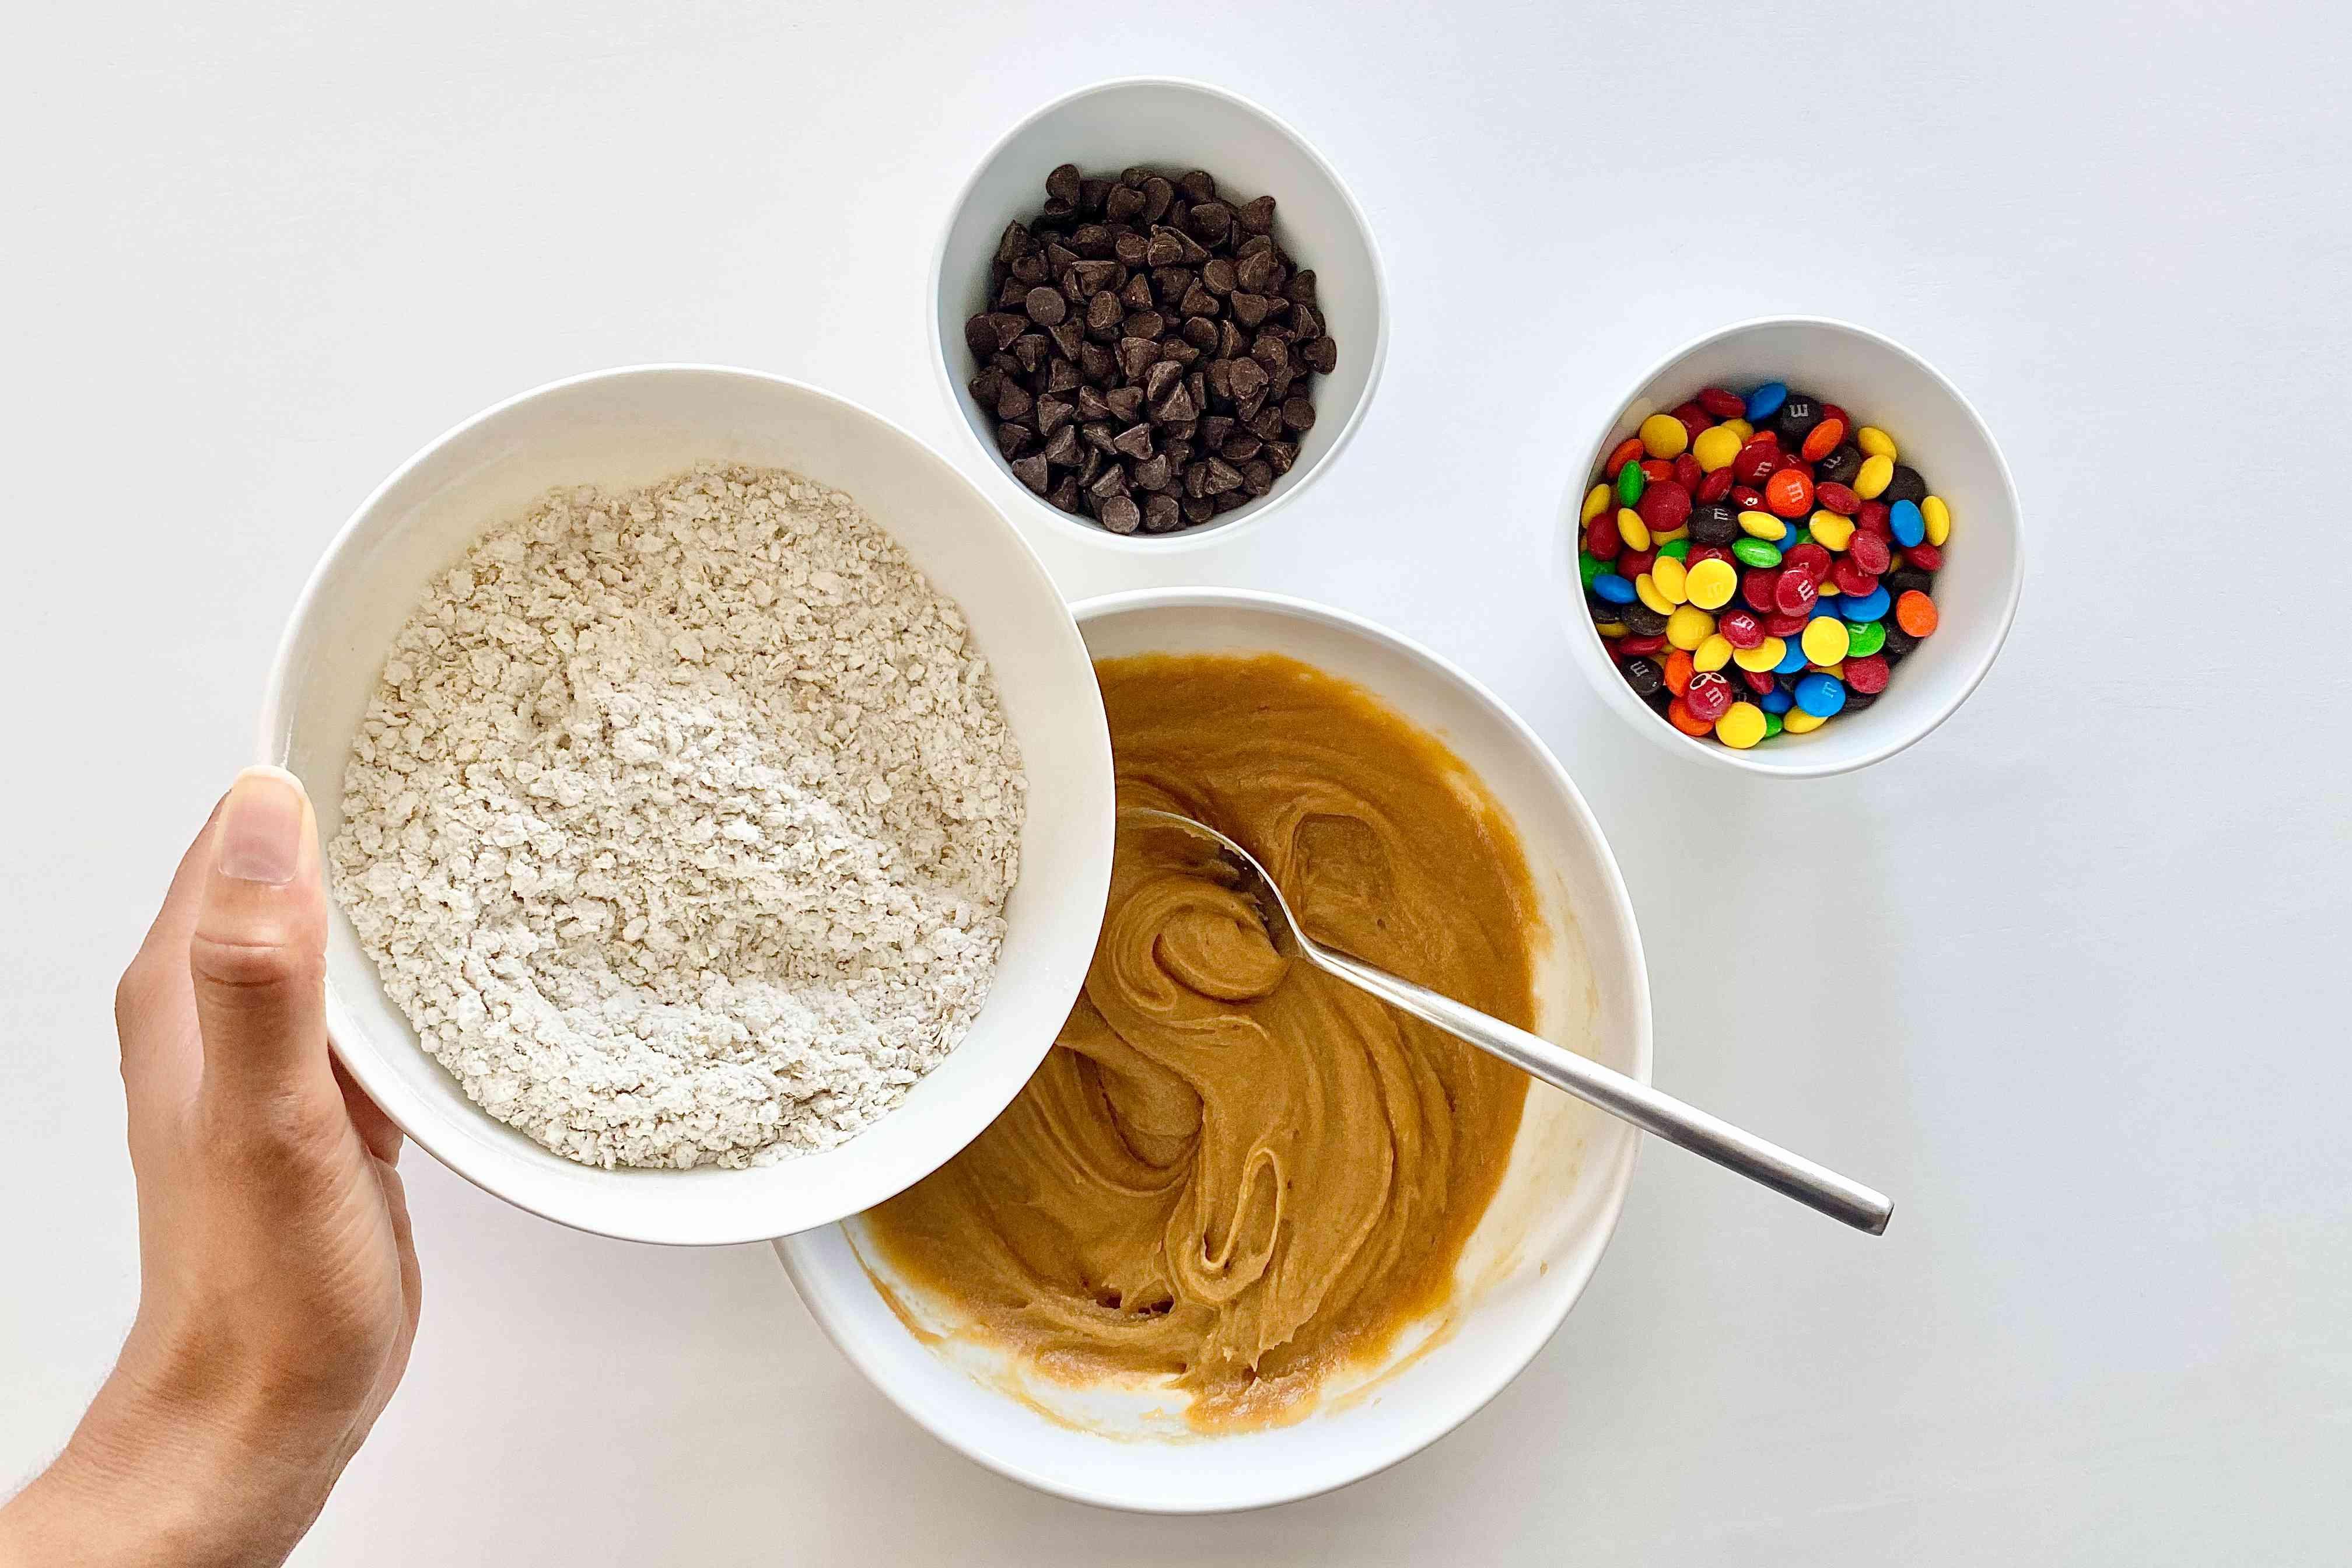 Adding flour mixture to wet mixture to make Gluten-Free Sheet Pan Monster Cookies.